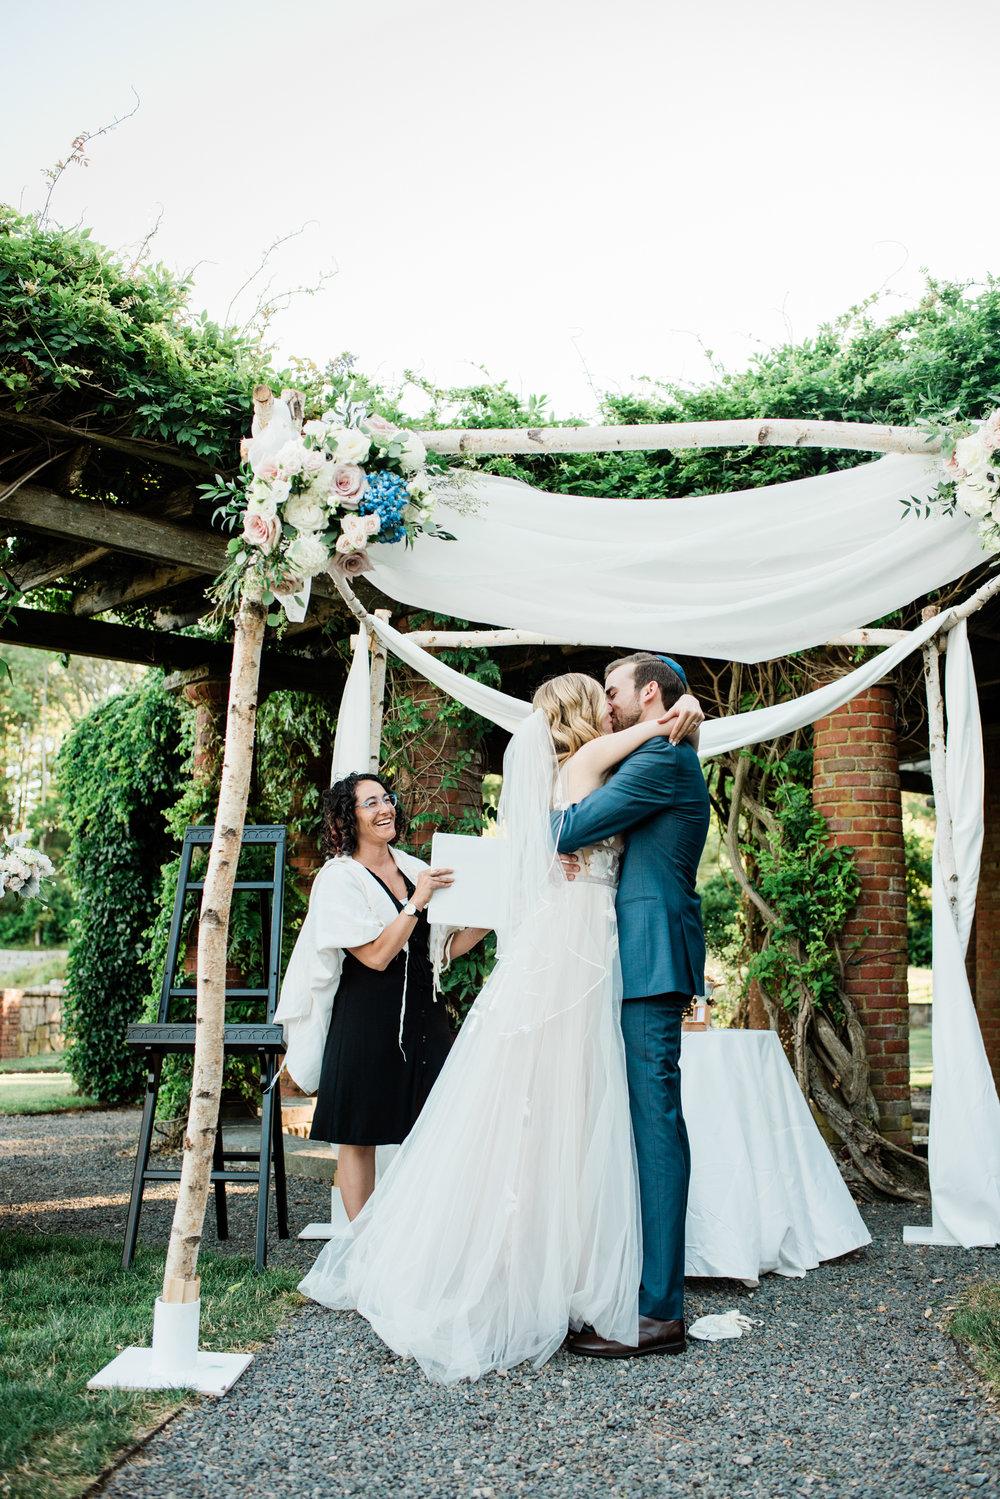 Best Wedding Photographers in Northampton MA